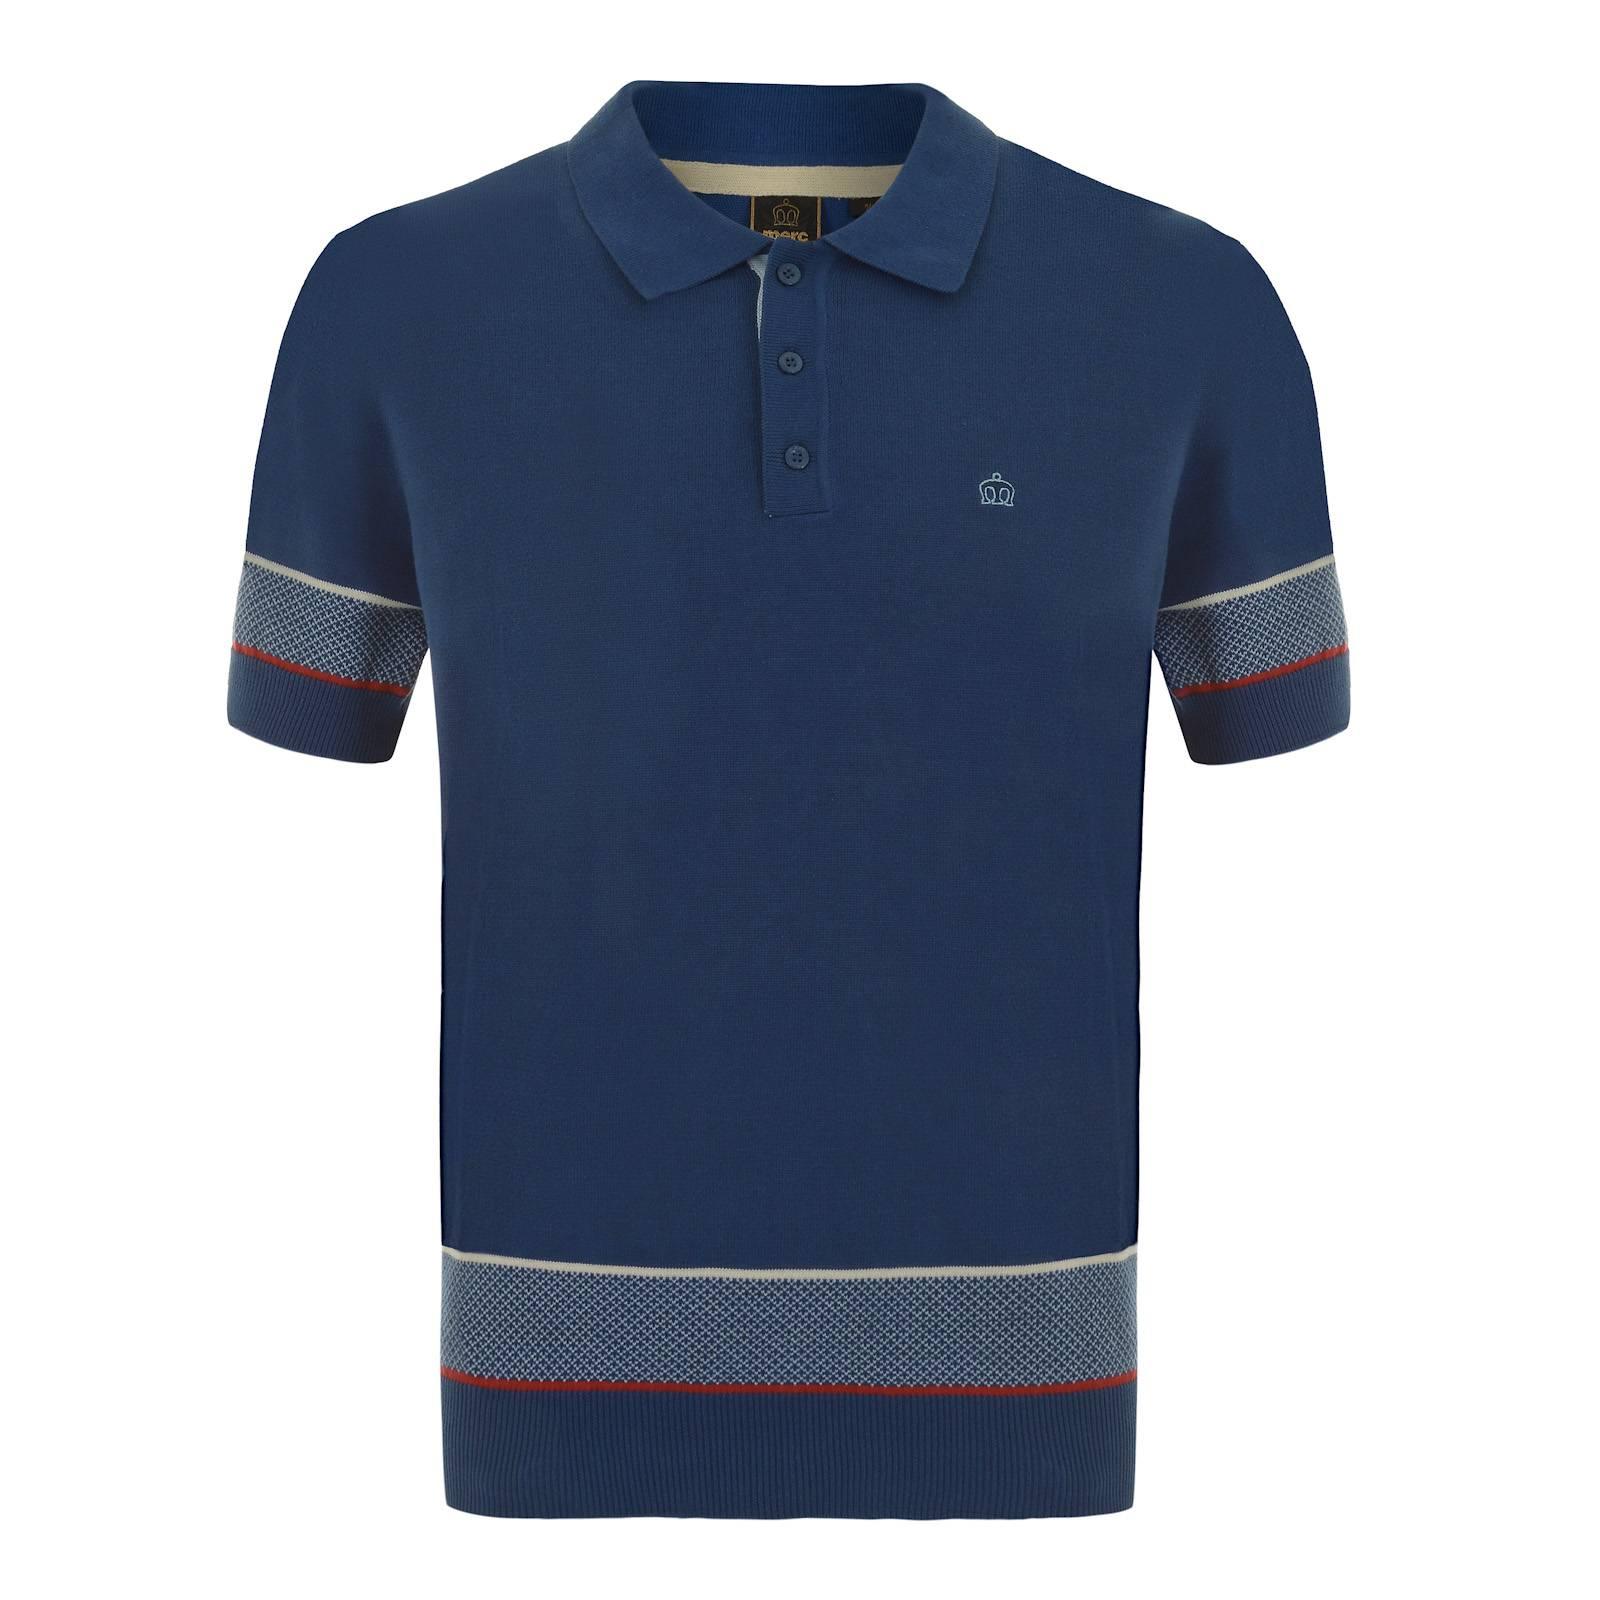 Рубашка Поло JunoПоло<br><br><br>Артикул: 1615103<br>Материал: 100% хлопок<br>Цвет: синий<br>Пол: Мужской